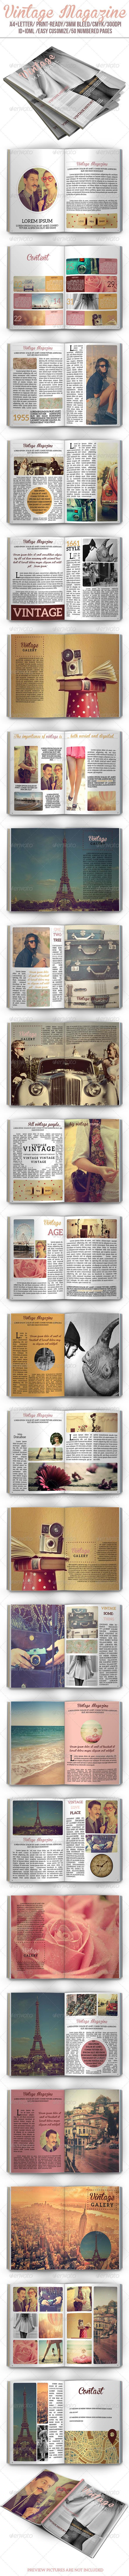 GraphicRiver Vintage Magazine 6470157